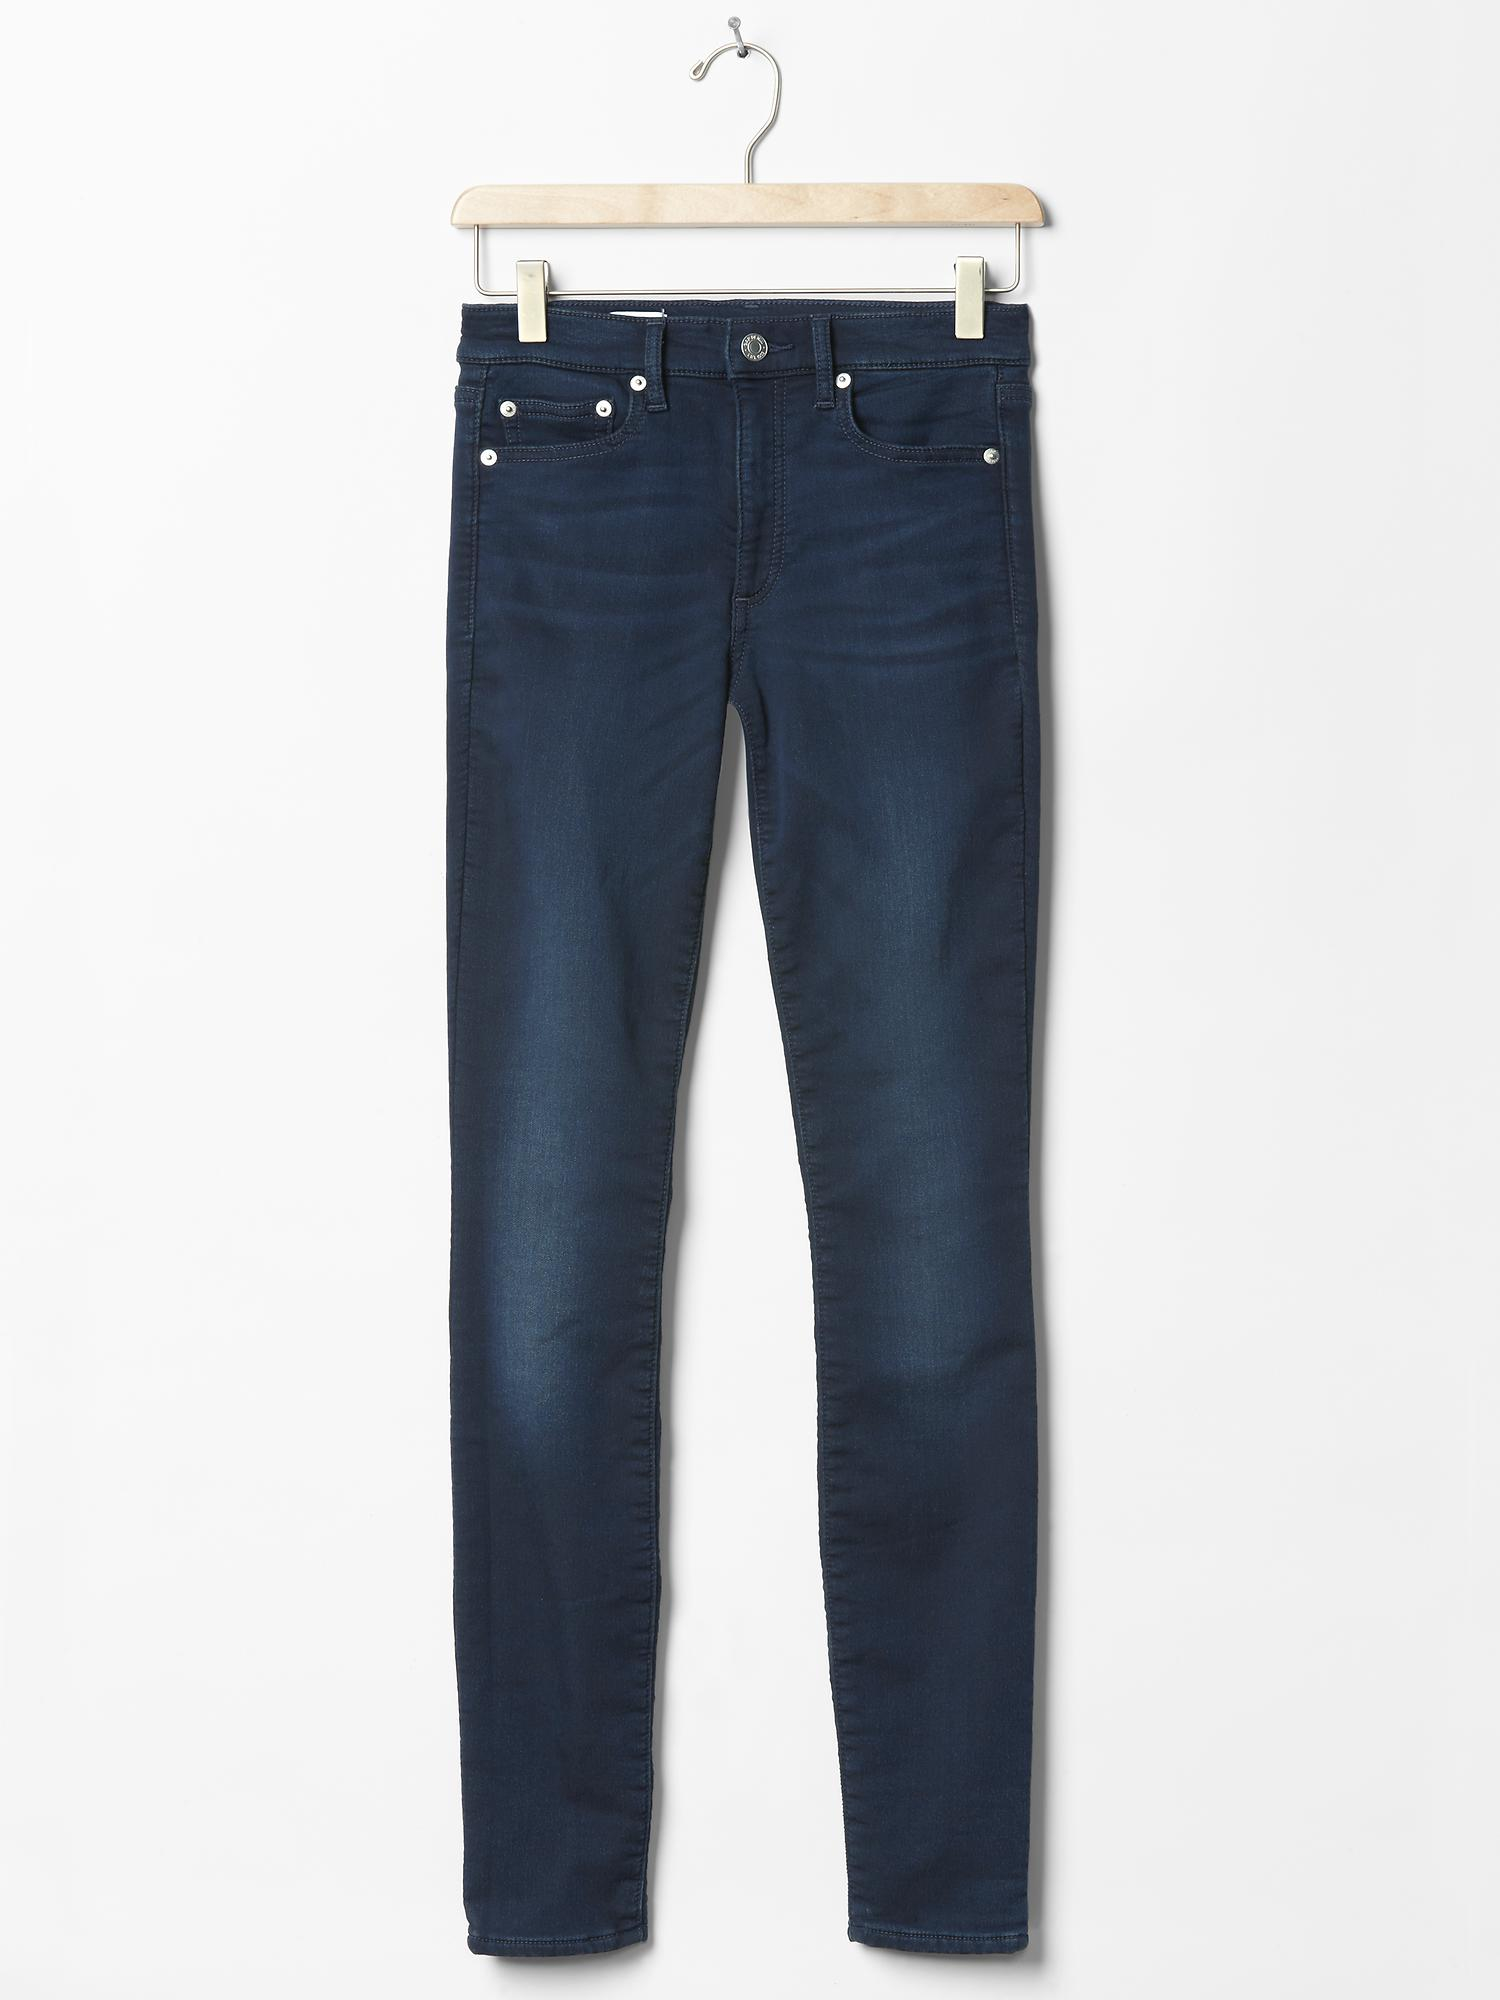 gap 1969 knit true skinny jeans in blue  dark indigo